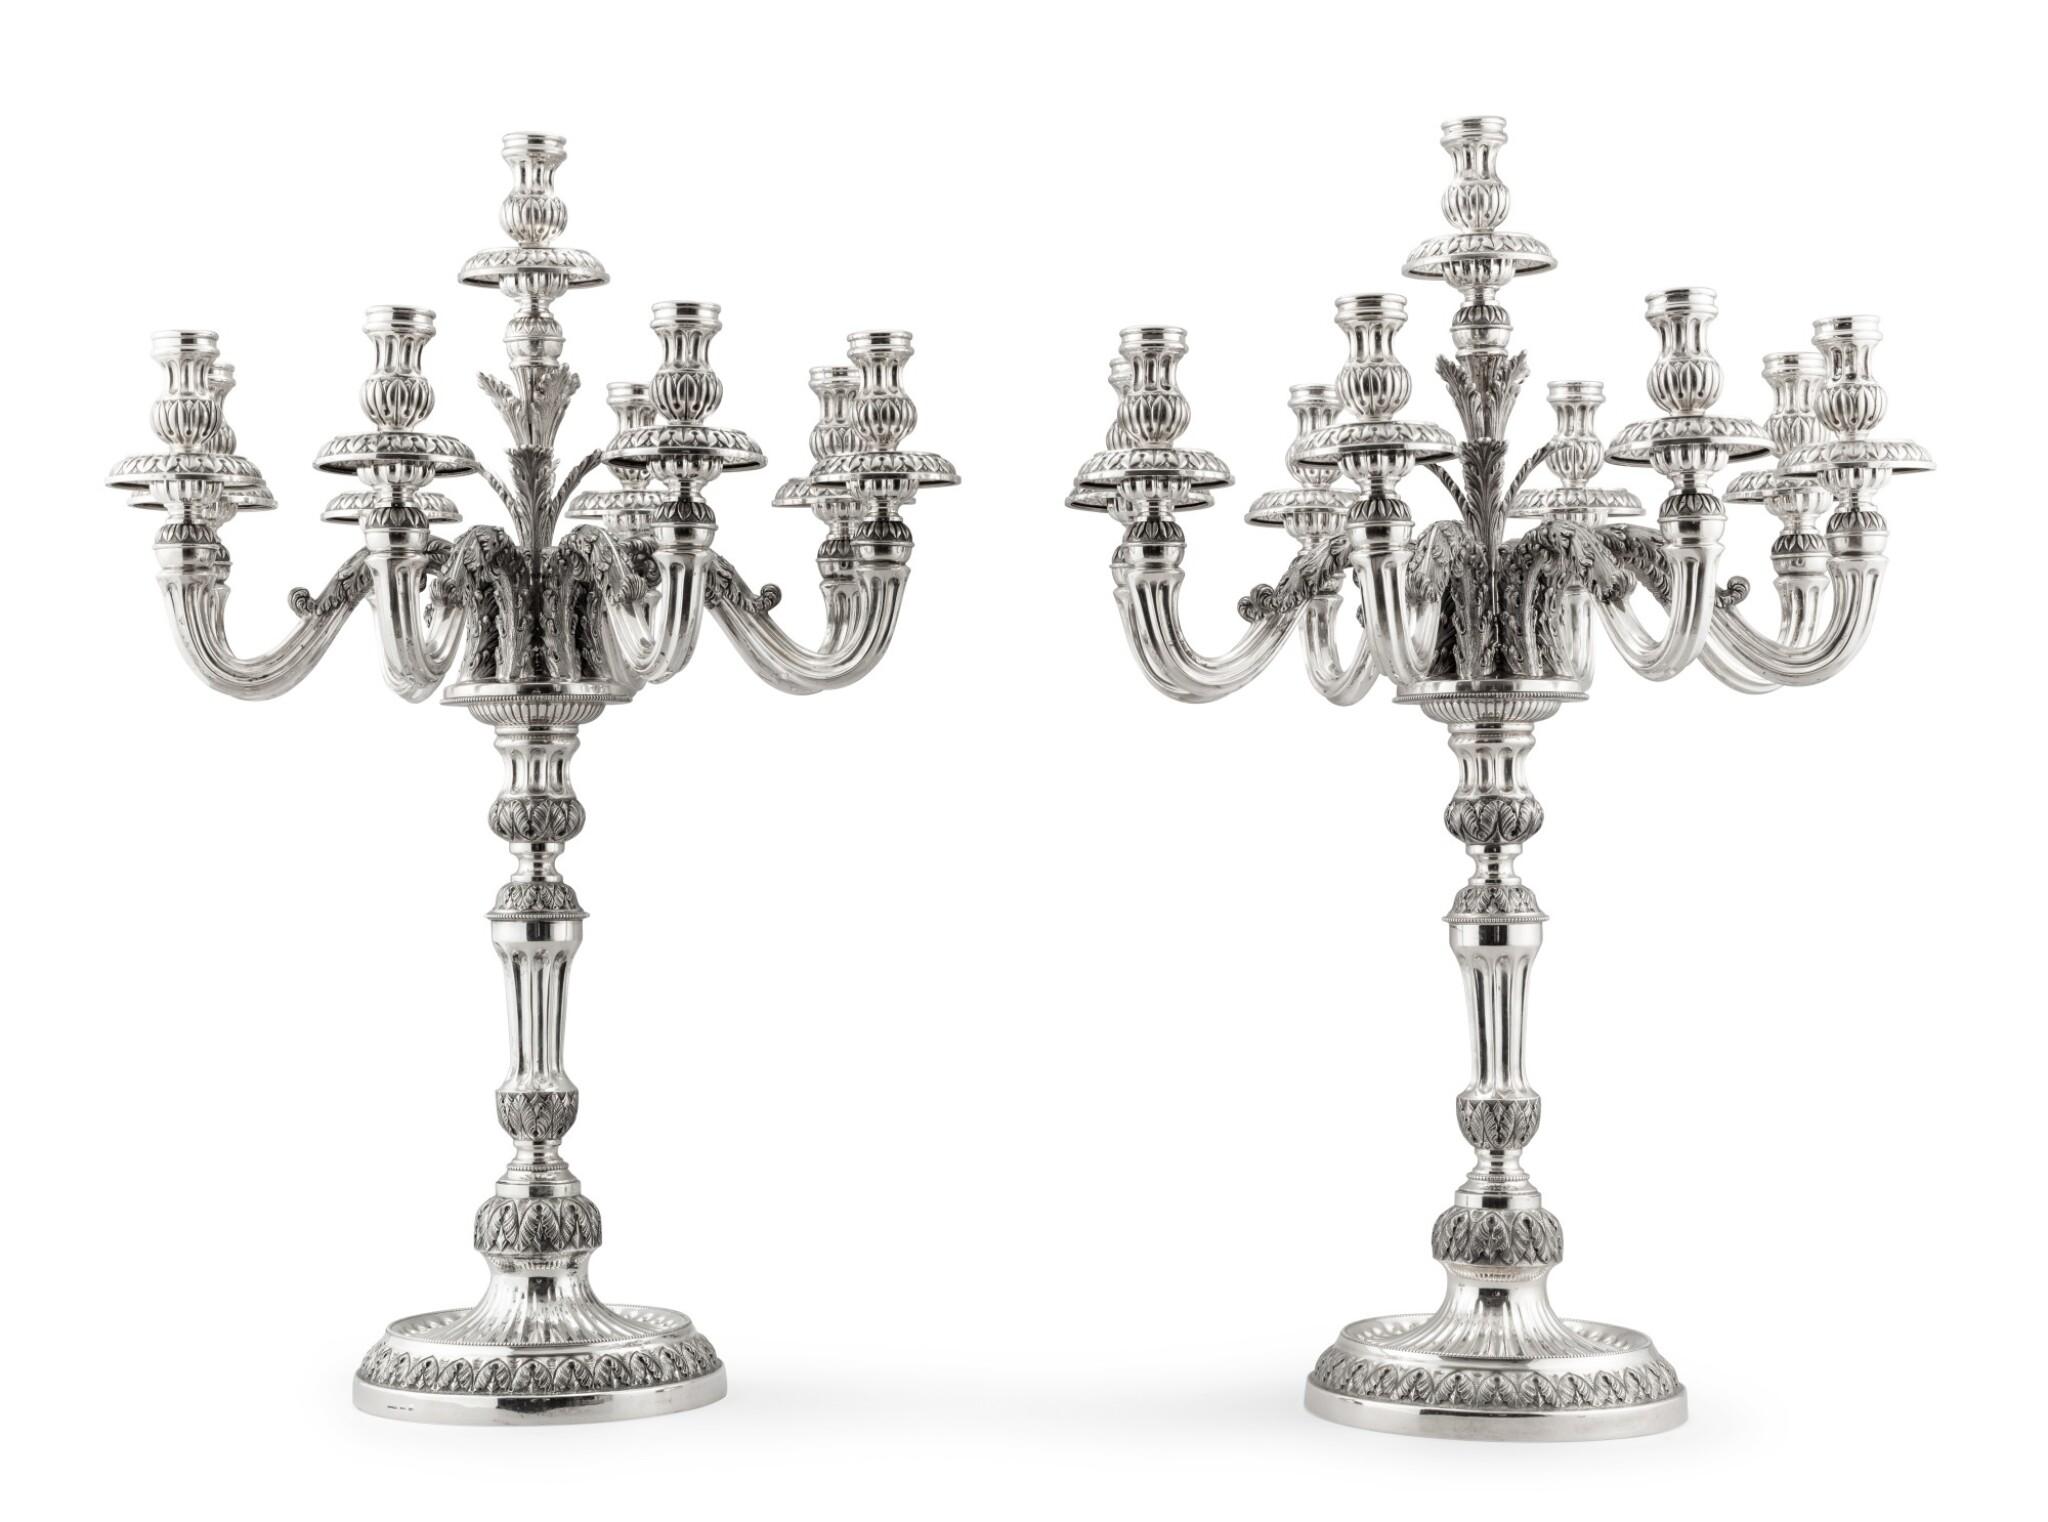 An Italian silver pair of large nine-light candelabra, Buccellati, Milan, circa 1980 | Paire de grands chandeliers à neuf lumières en argent par Buccellati, Milan, vers 1980